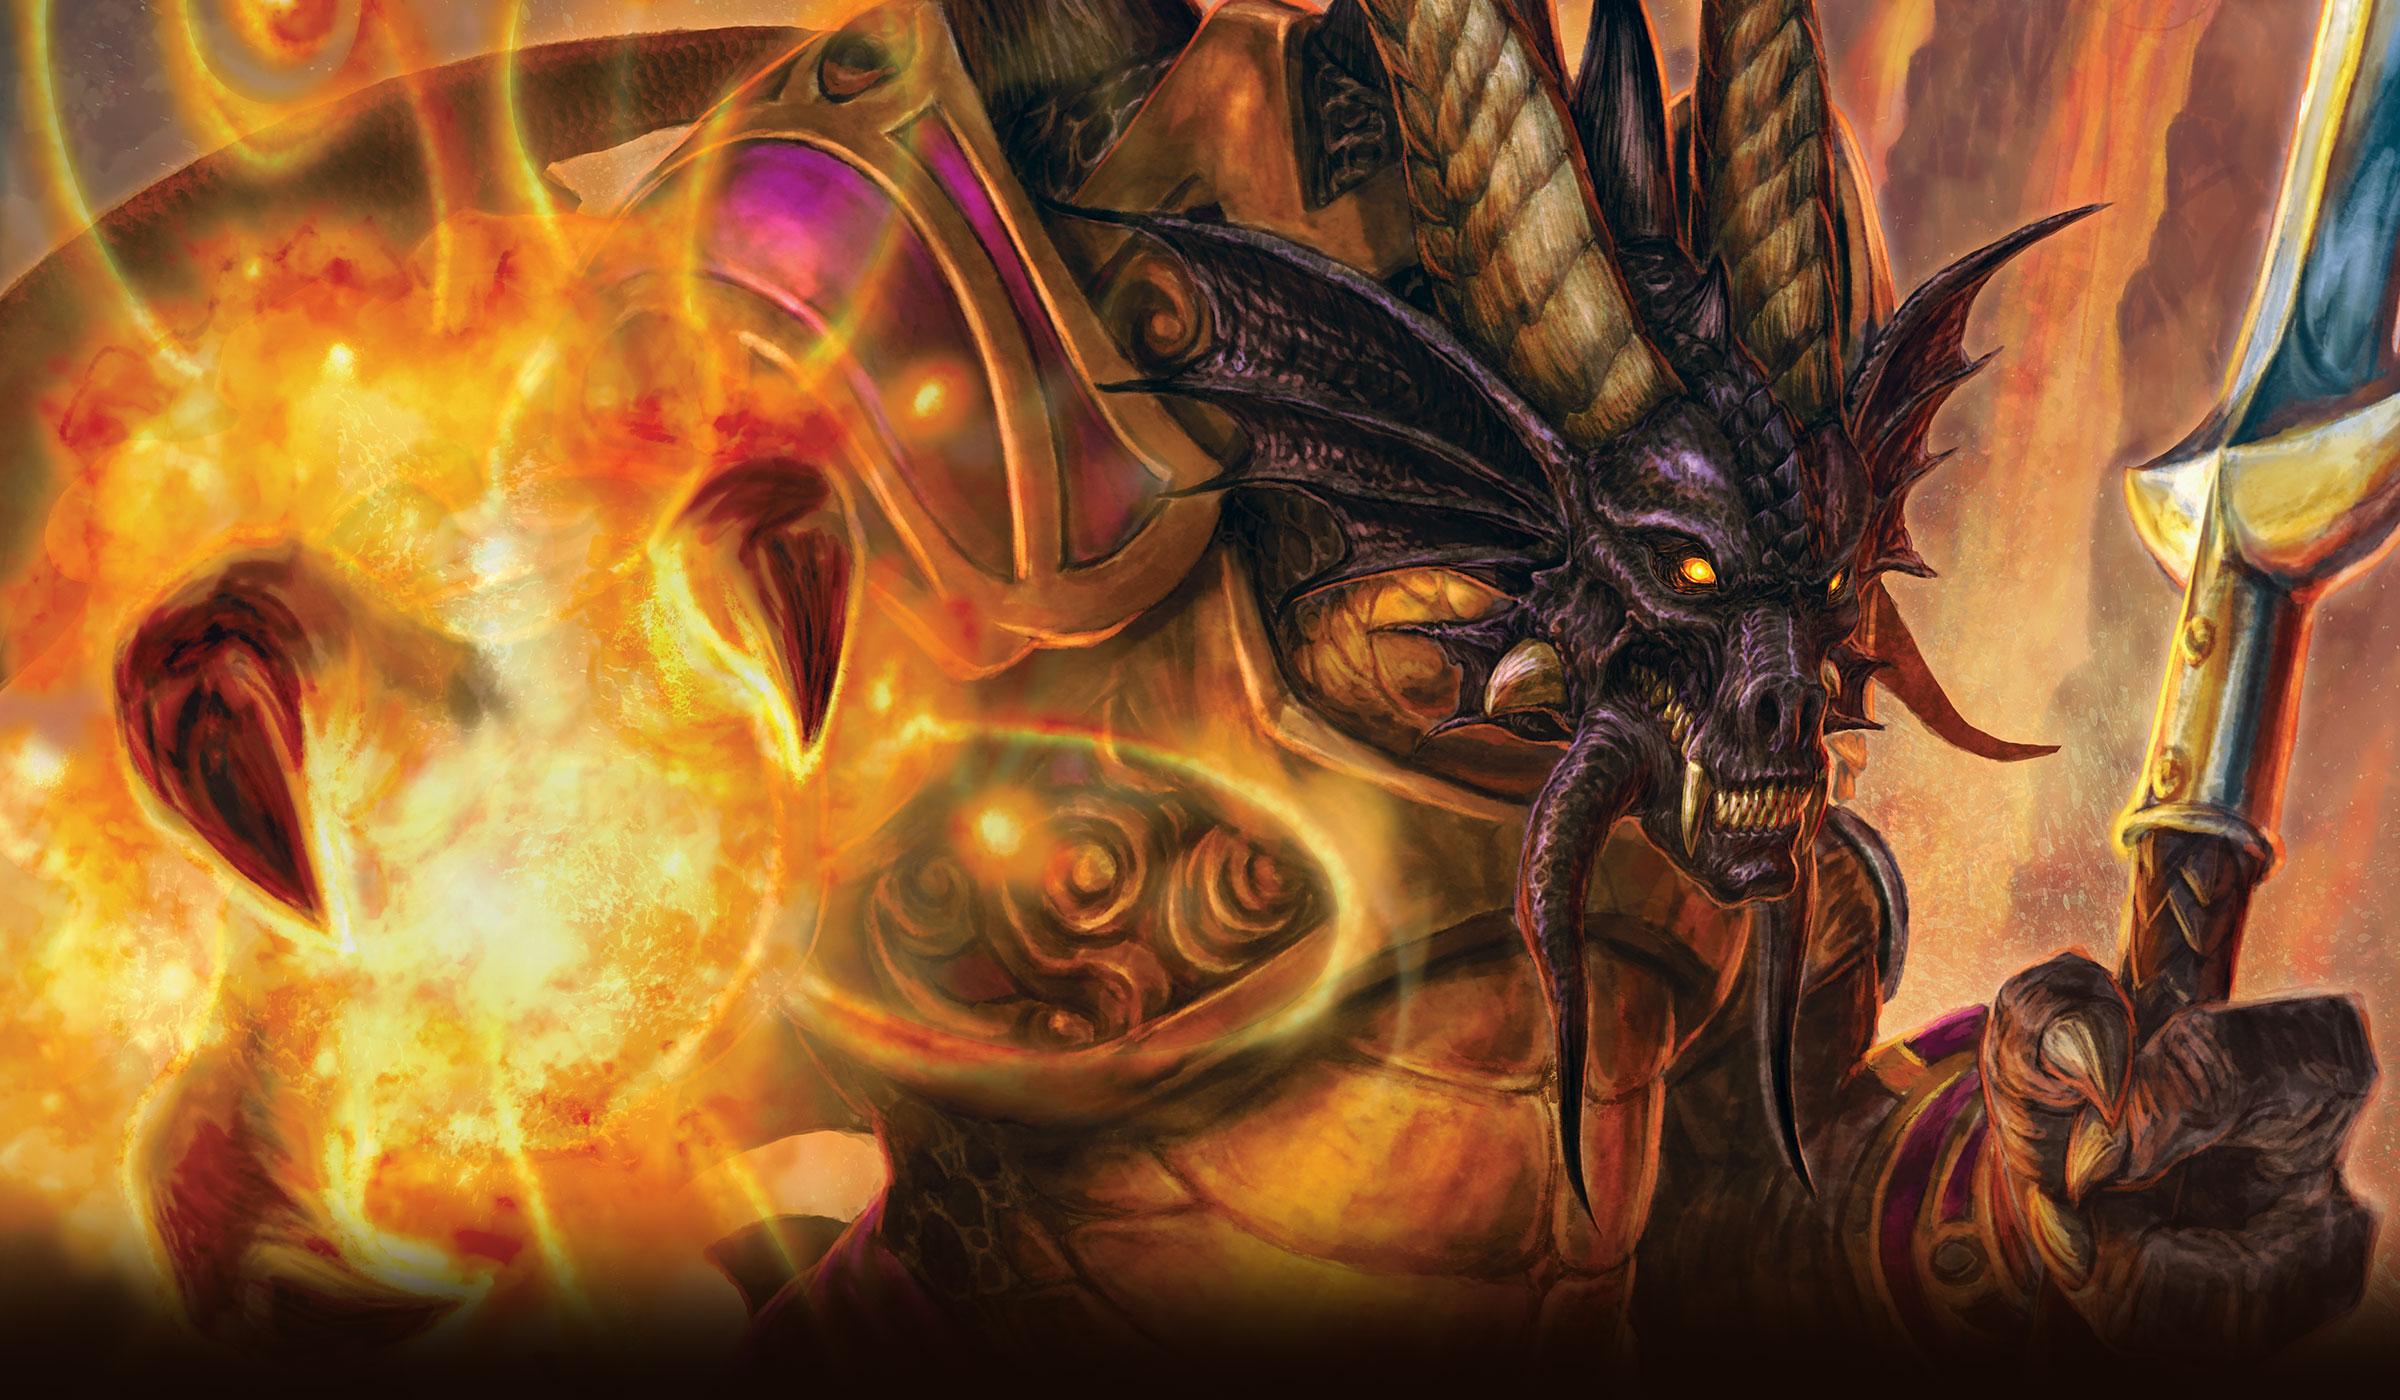 Investida ao Covil do Asa Negra (Assault on Black Wing Lair) | World of WarCraft, WarCraft, wow, azeroth, lore